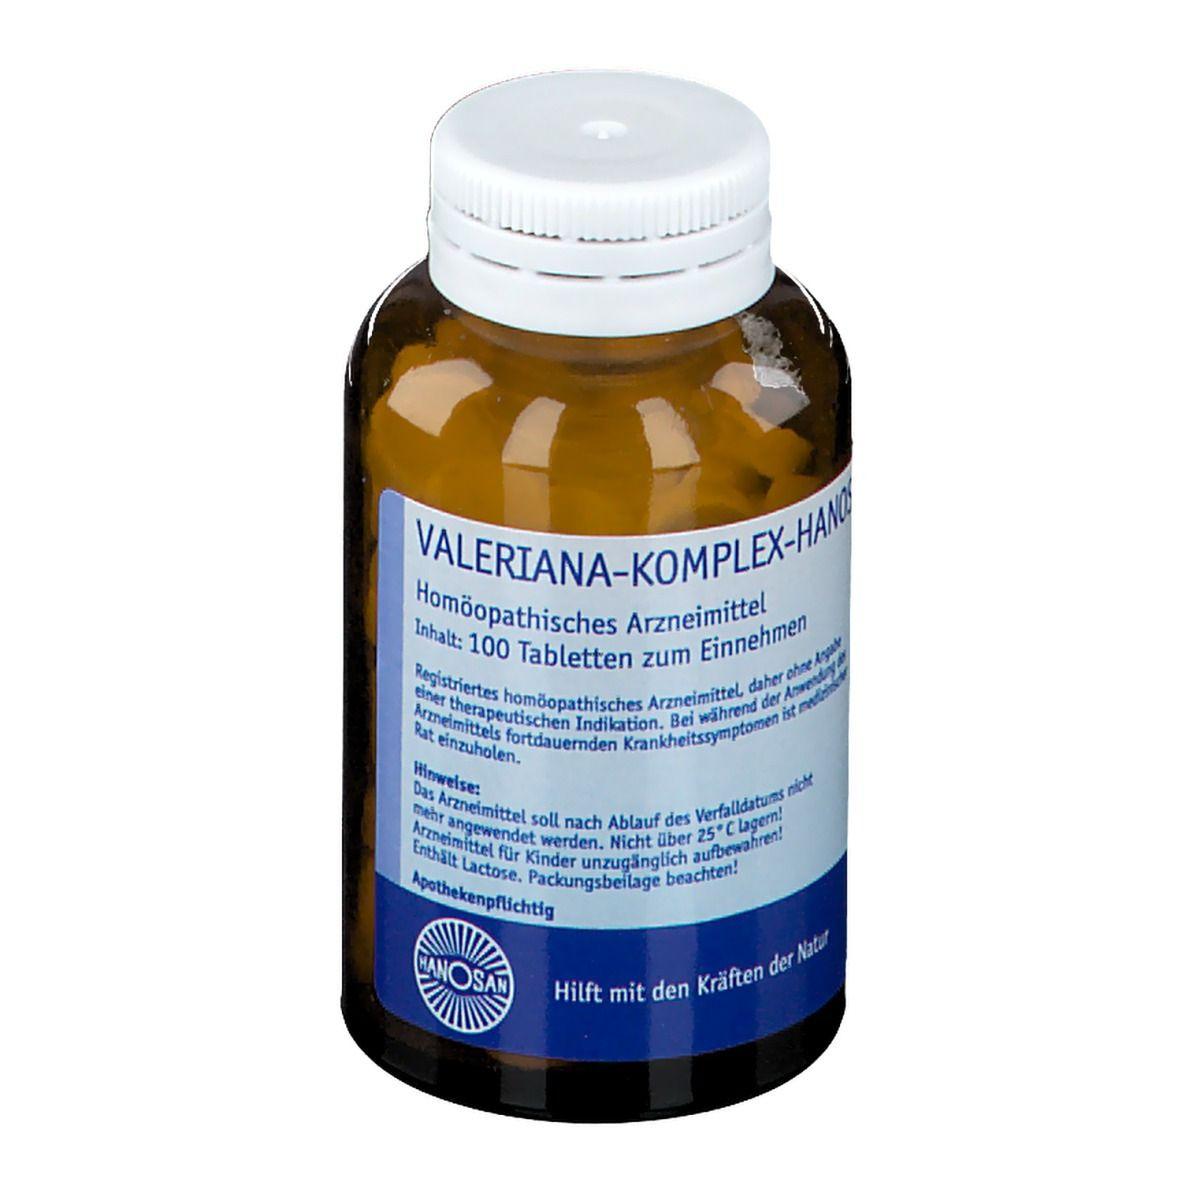 VALERIANA-KOMPLEX